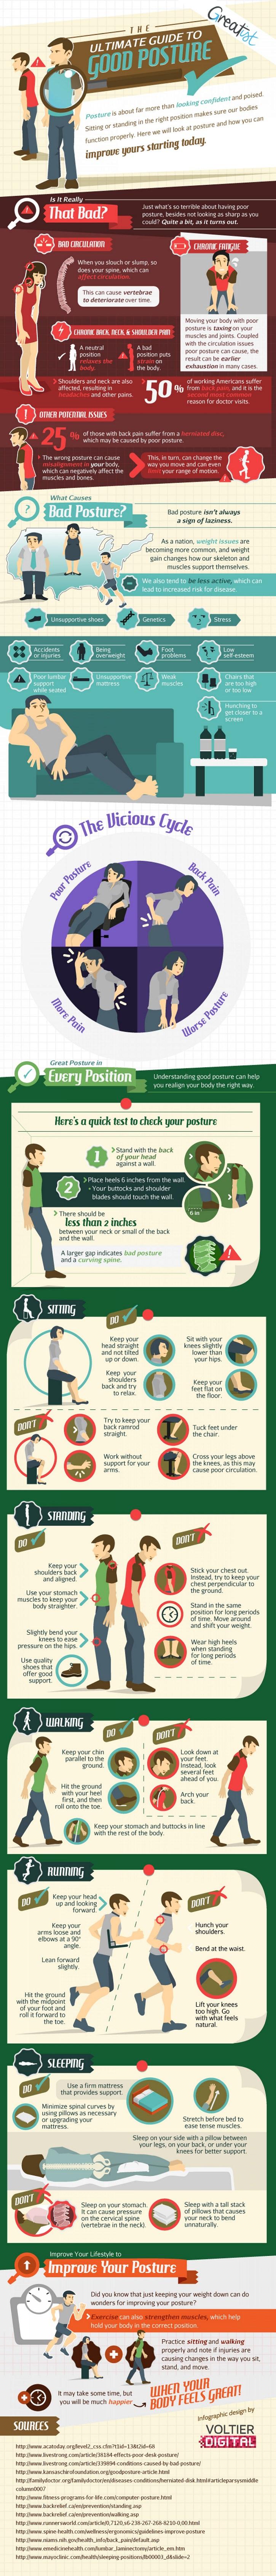 posture infographic